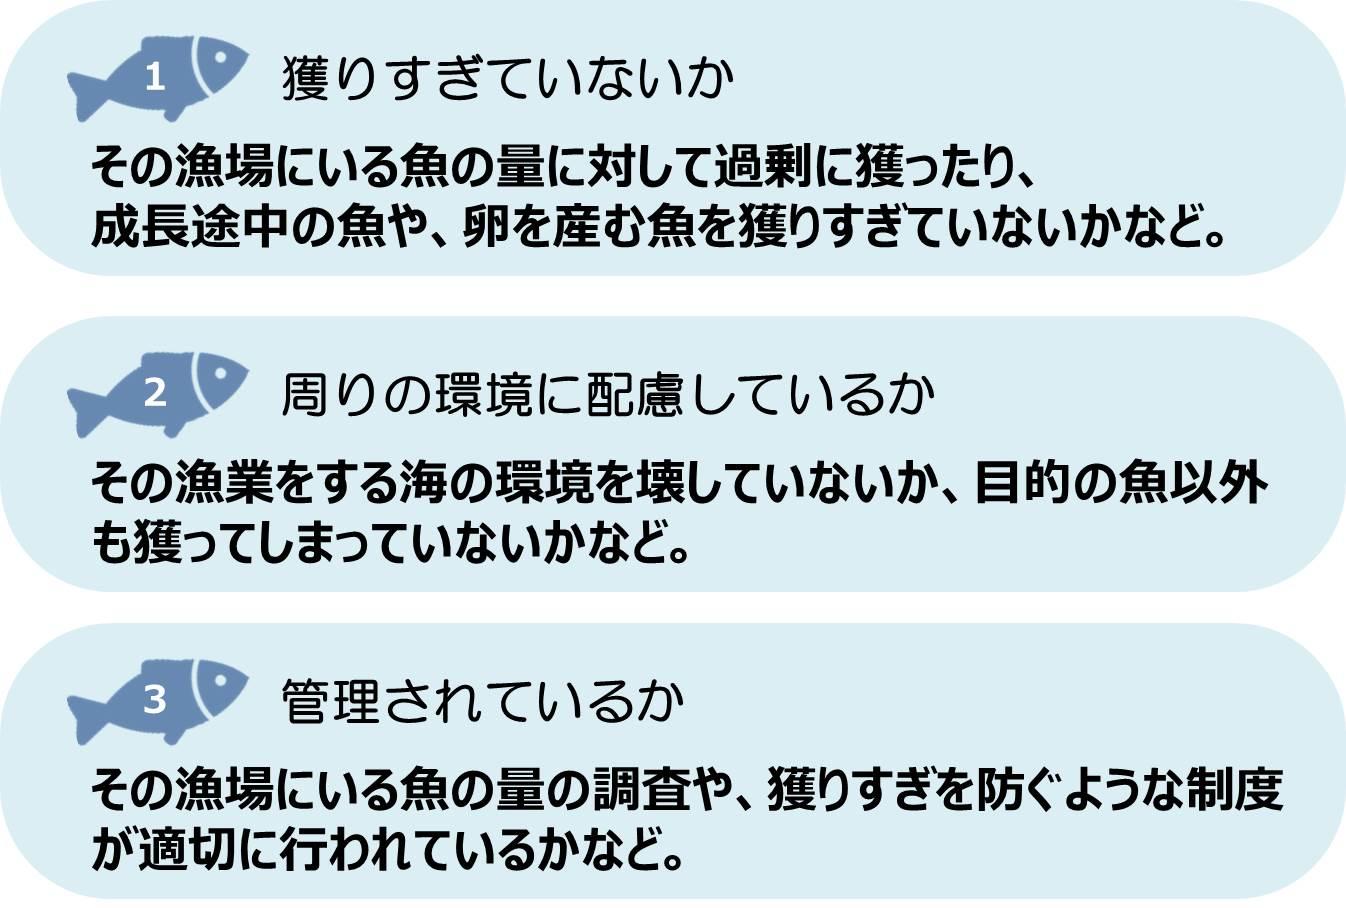 http://blog.miraikan.jst.go.jp/images/20170120_takahashi_03.jpg